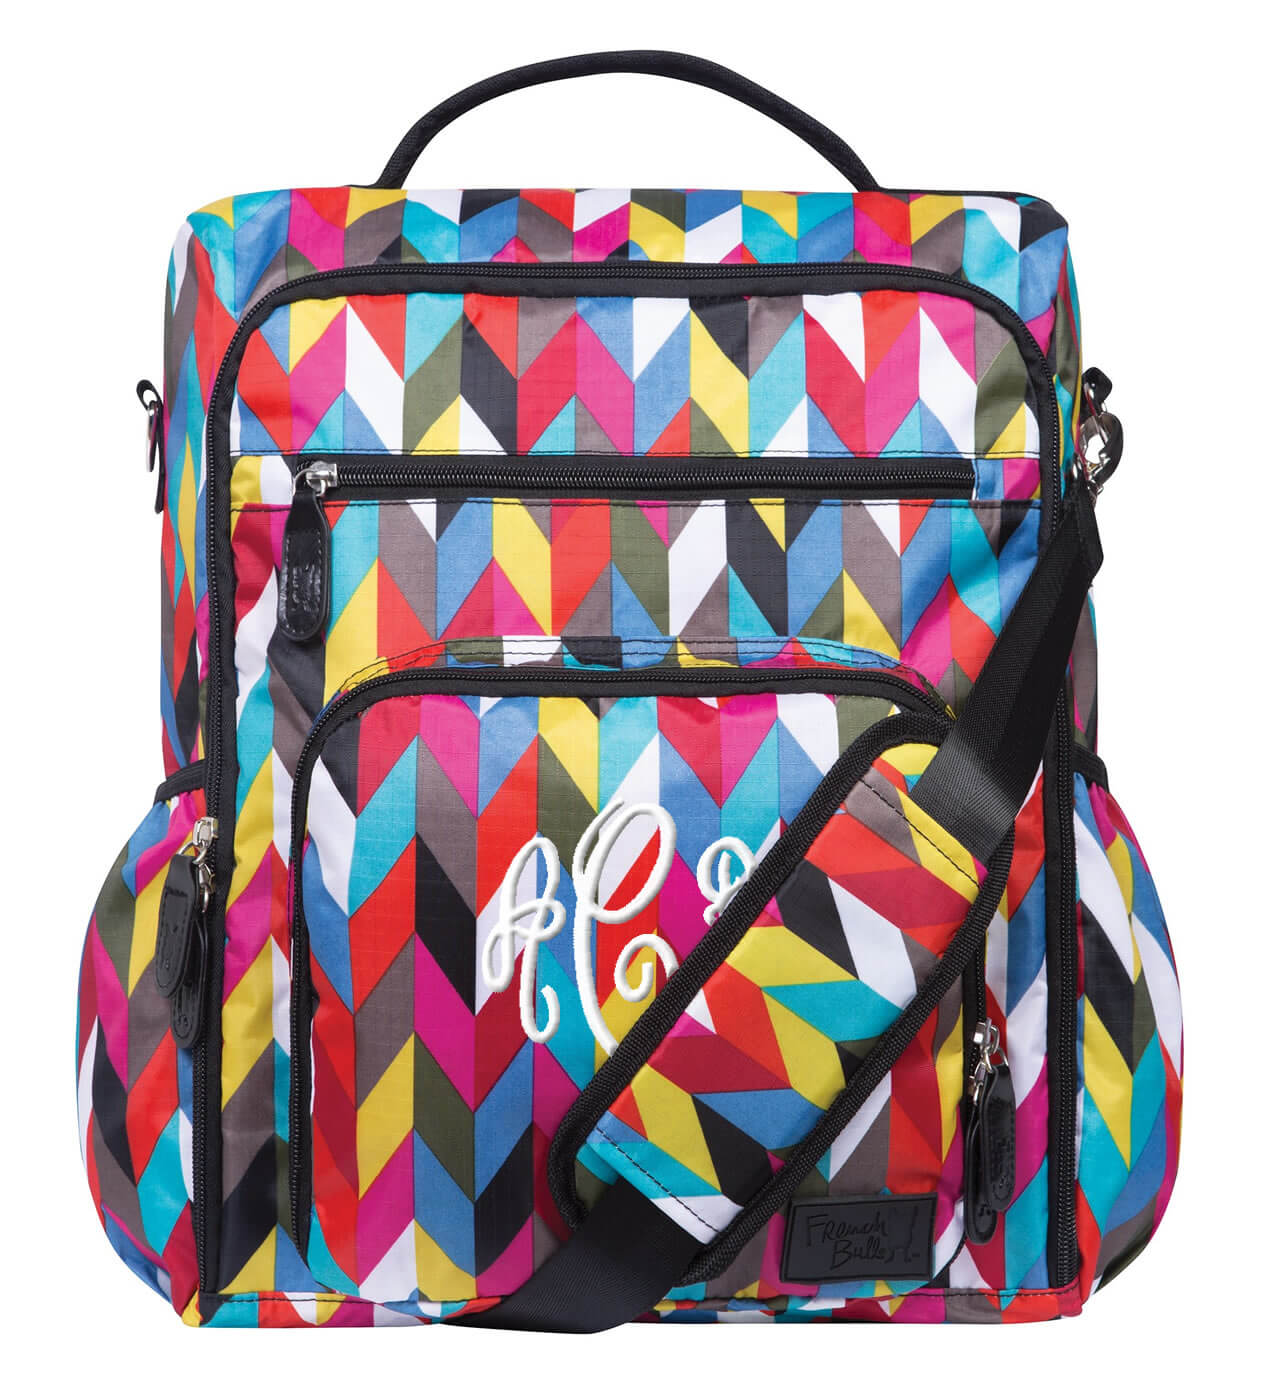 Personalized Zig Zag Messenger Bag